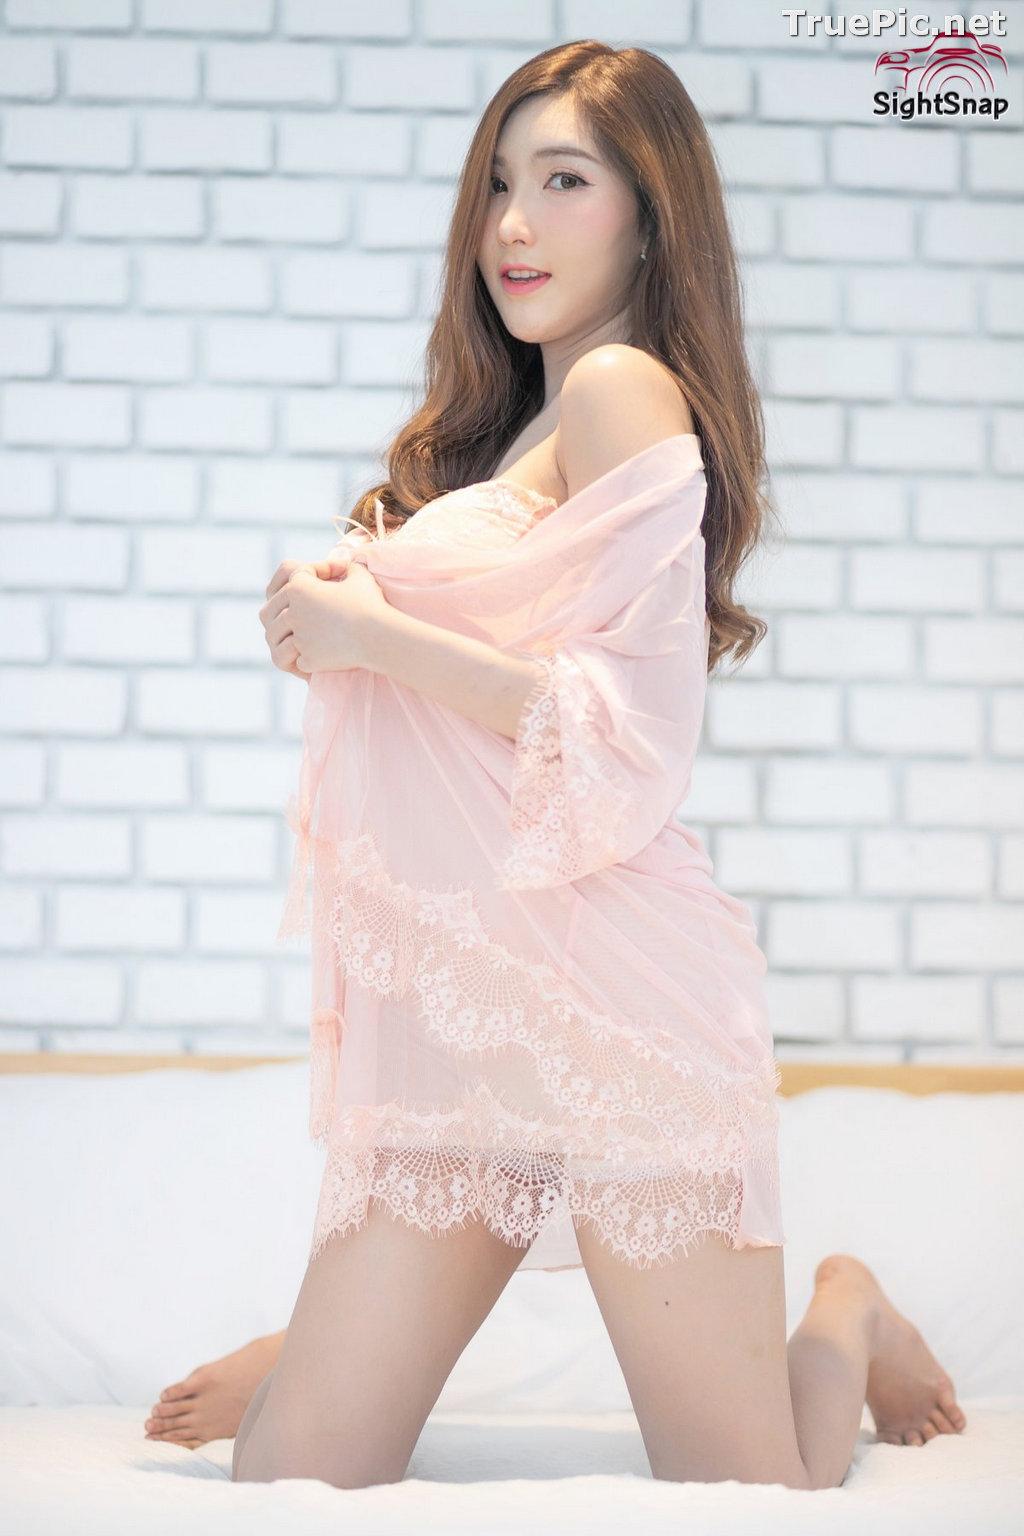 Image Thailand Model - Luc Kie - Nice Pink Love Night Dress - TruePic.net - Picture-3